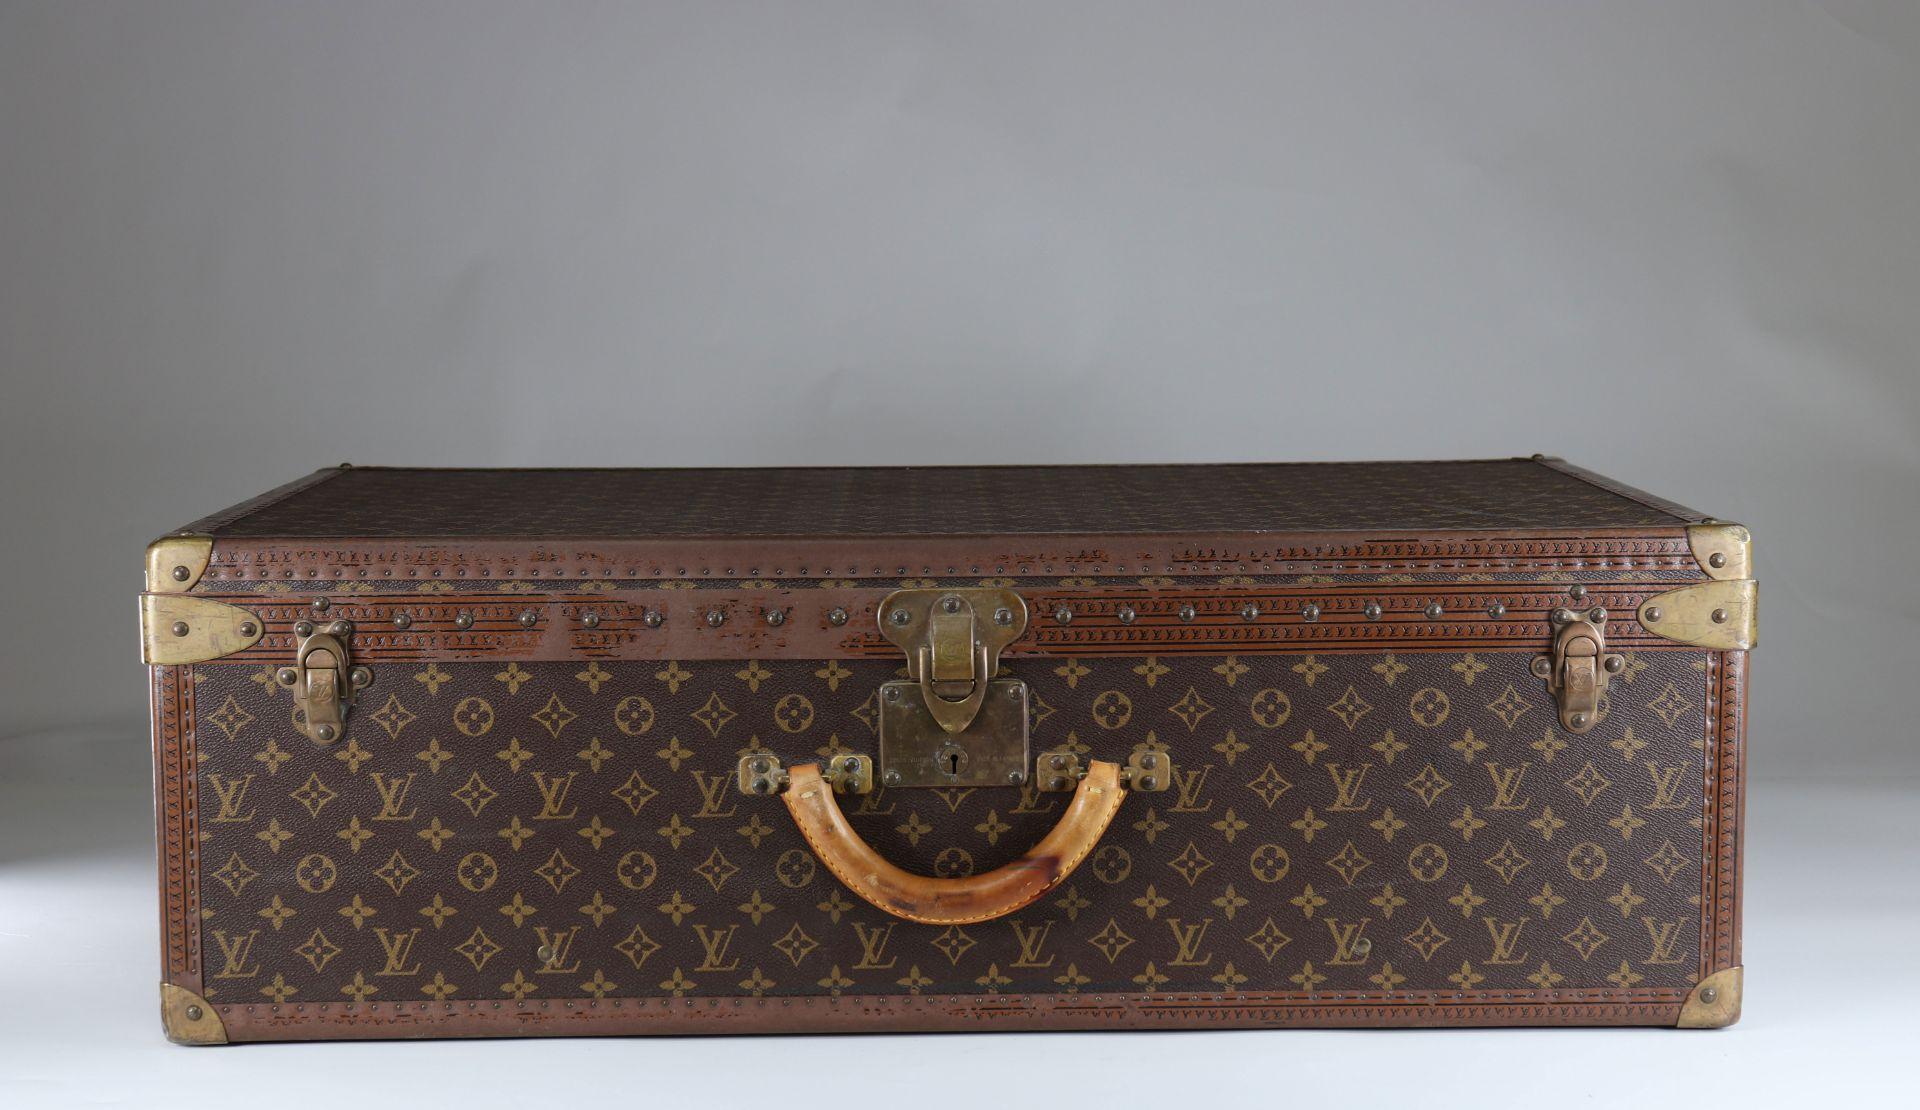 Louis Vuitton suitcase - Image 2 of 5